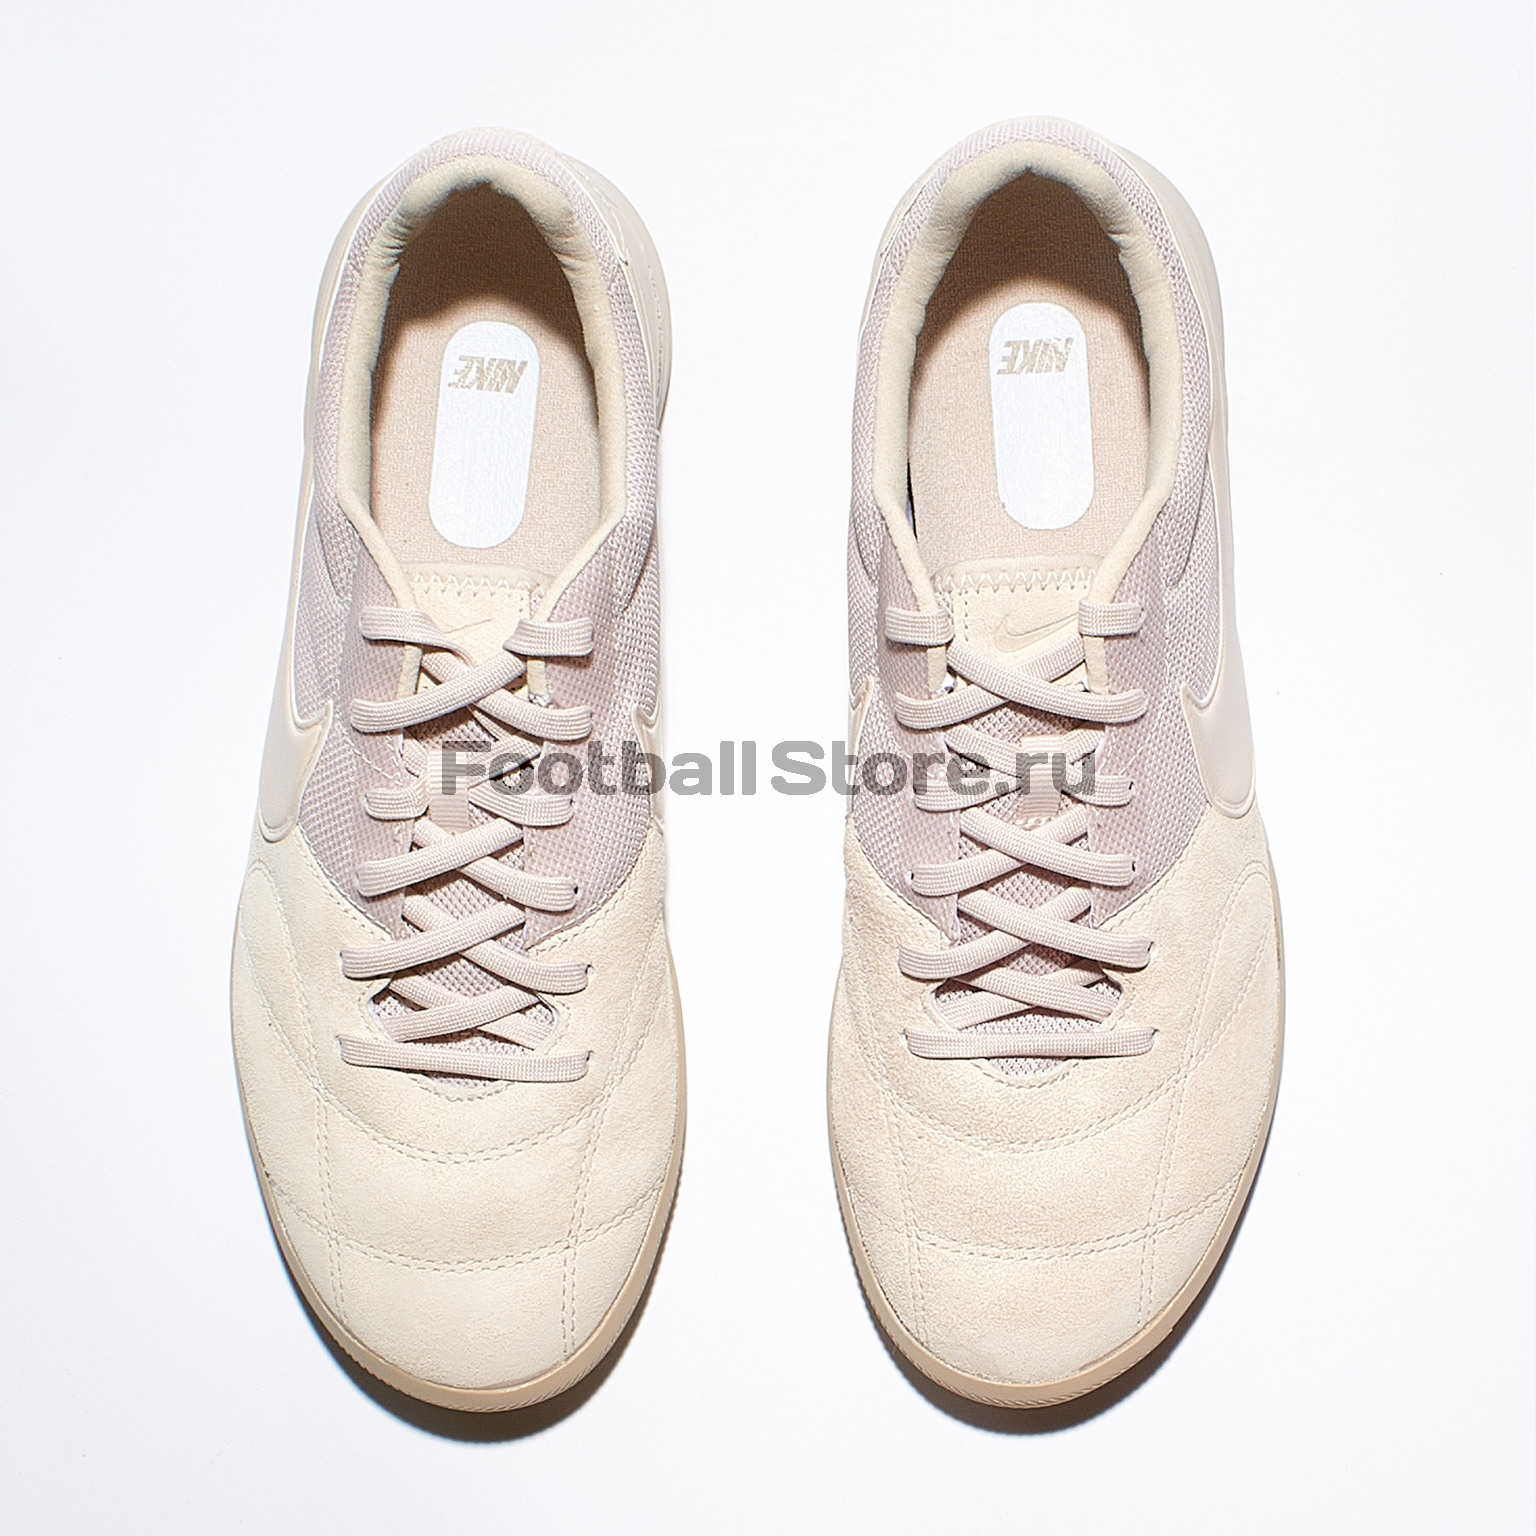 be75e120 ... Футзалки Nike Tiempo Premier II Sala AV3153-010. О ТОВАРЕ; РАСЧЕТ  ДОСТАВКИ